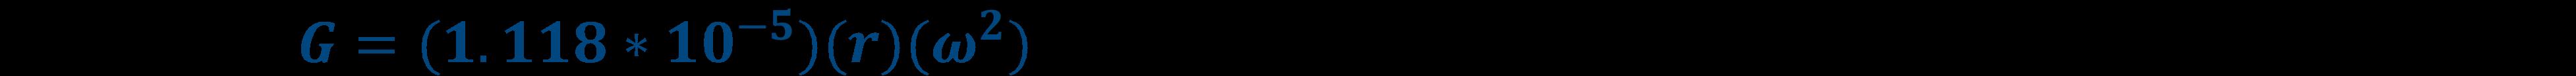 G Force Equation